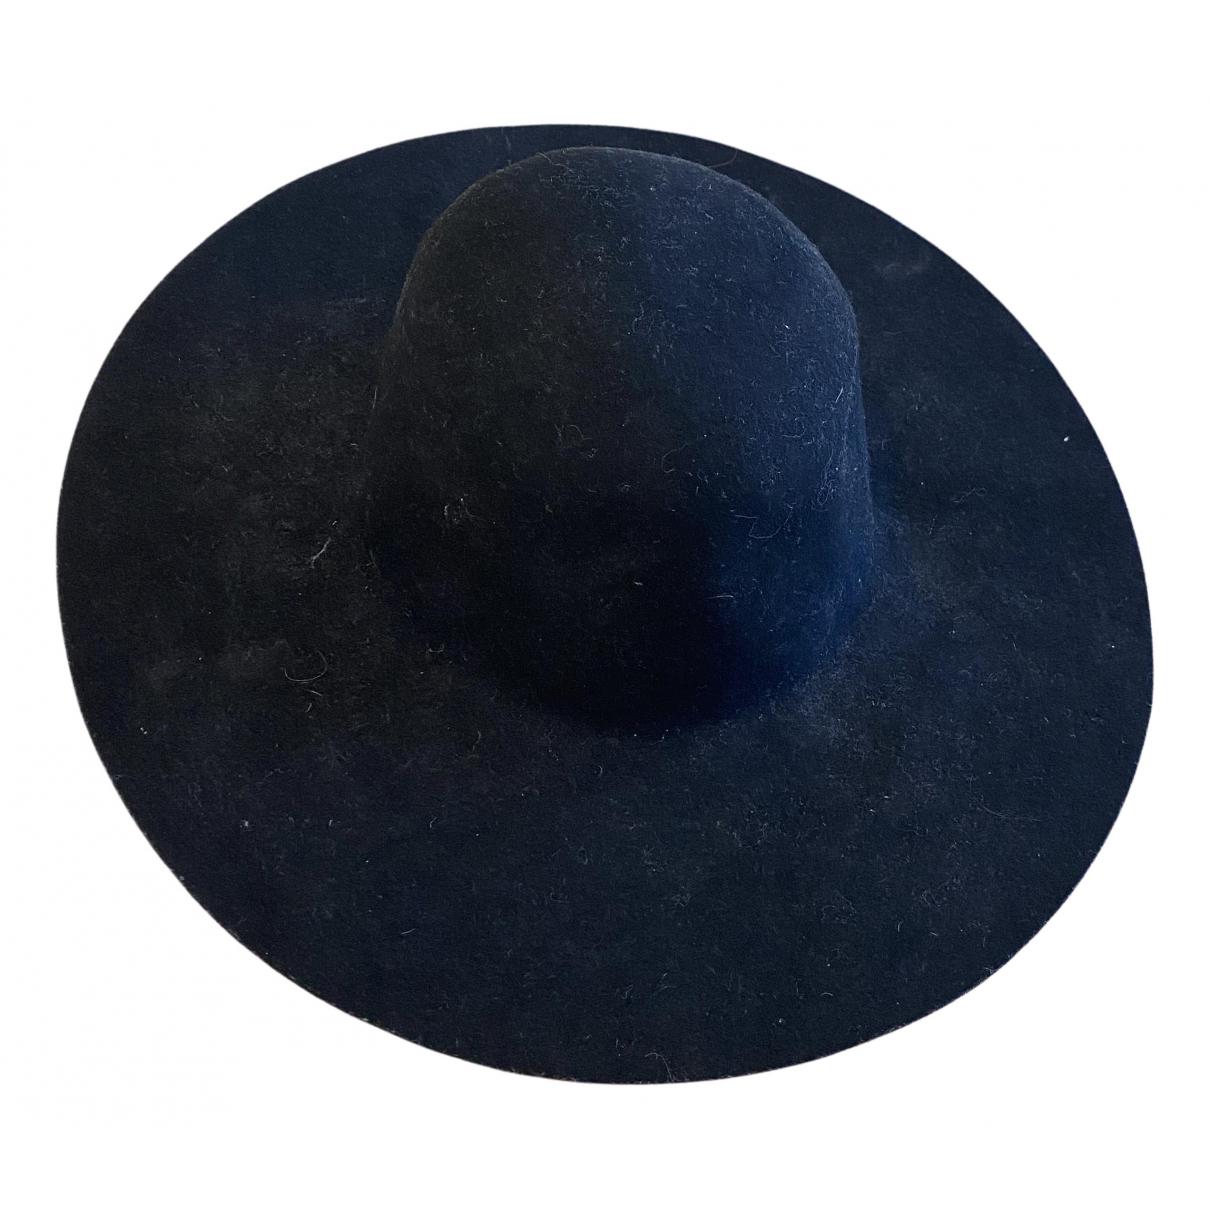 American Apparel \N Black Wool hat for Women S International